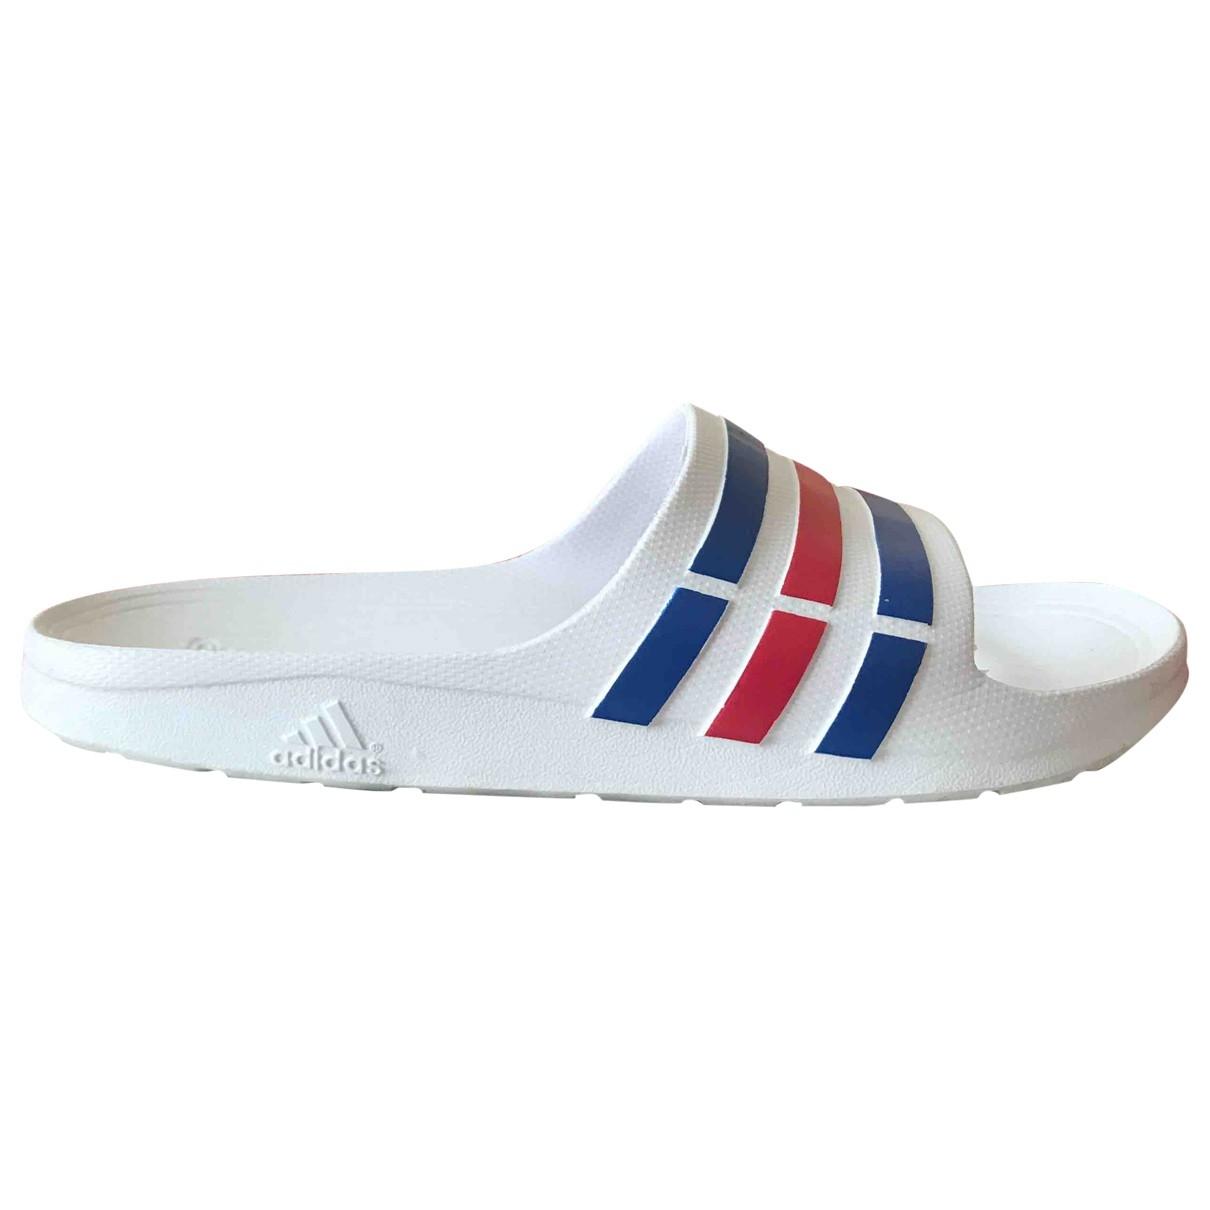 Adidas \N White Sandals for Women 7 UK